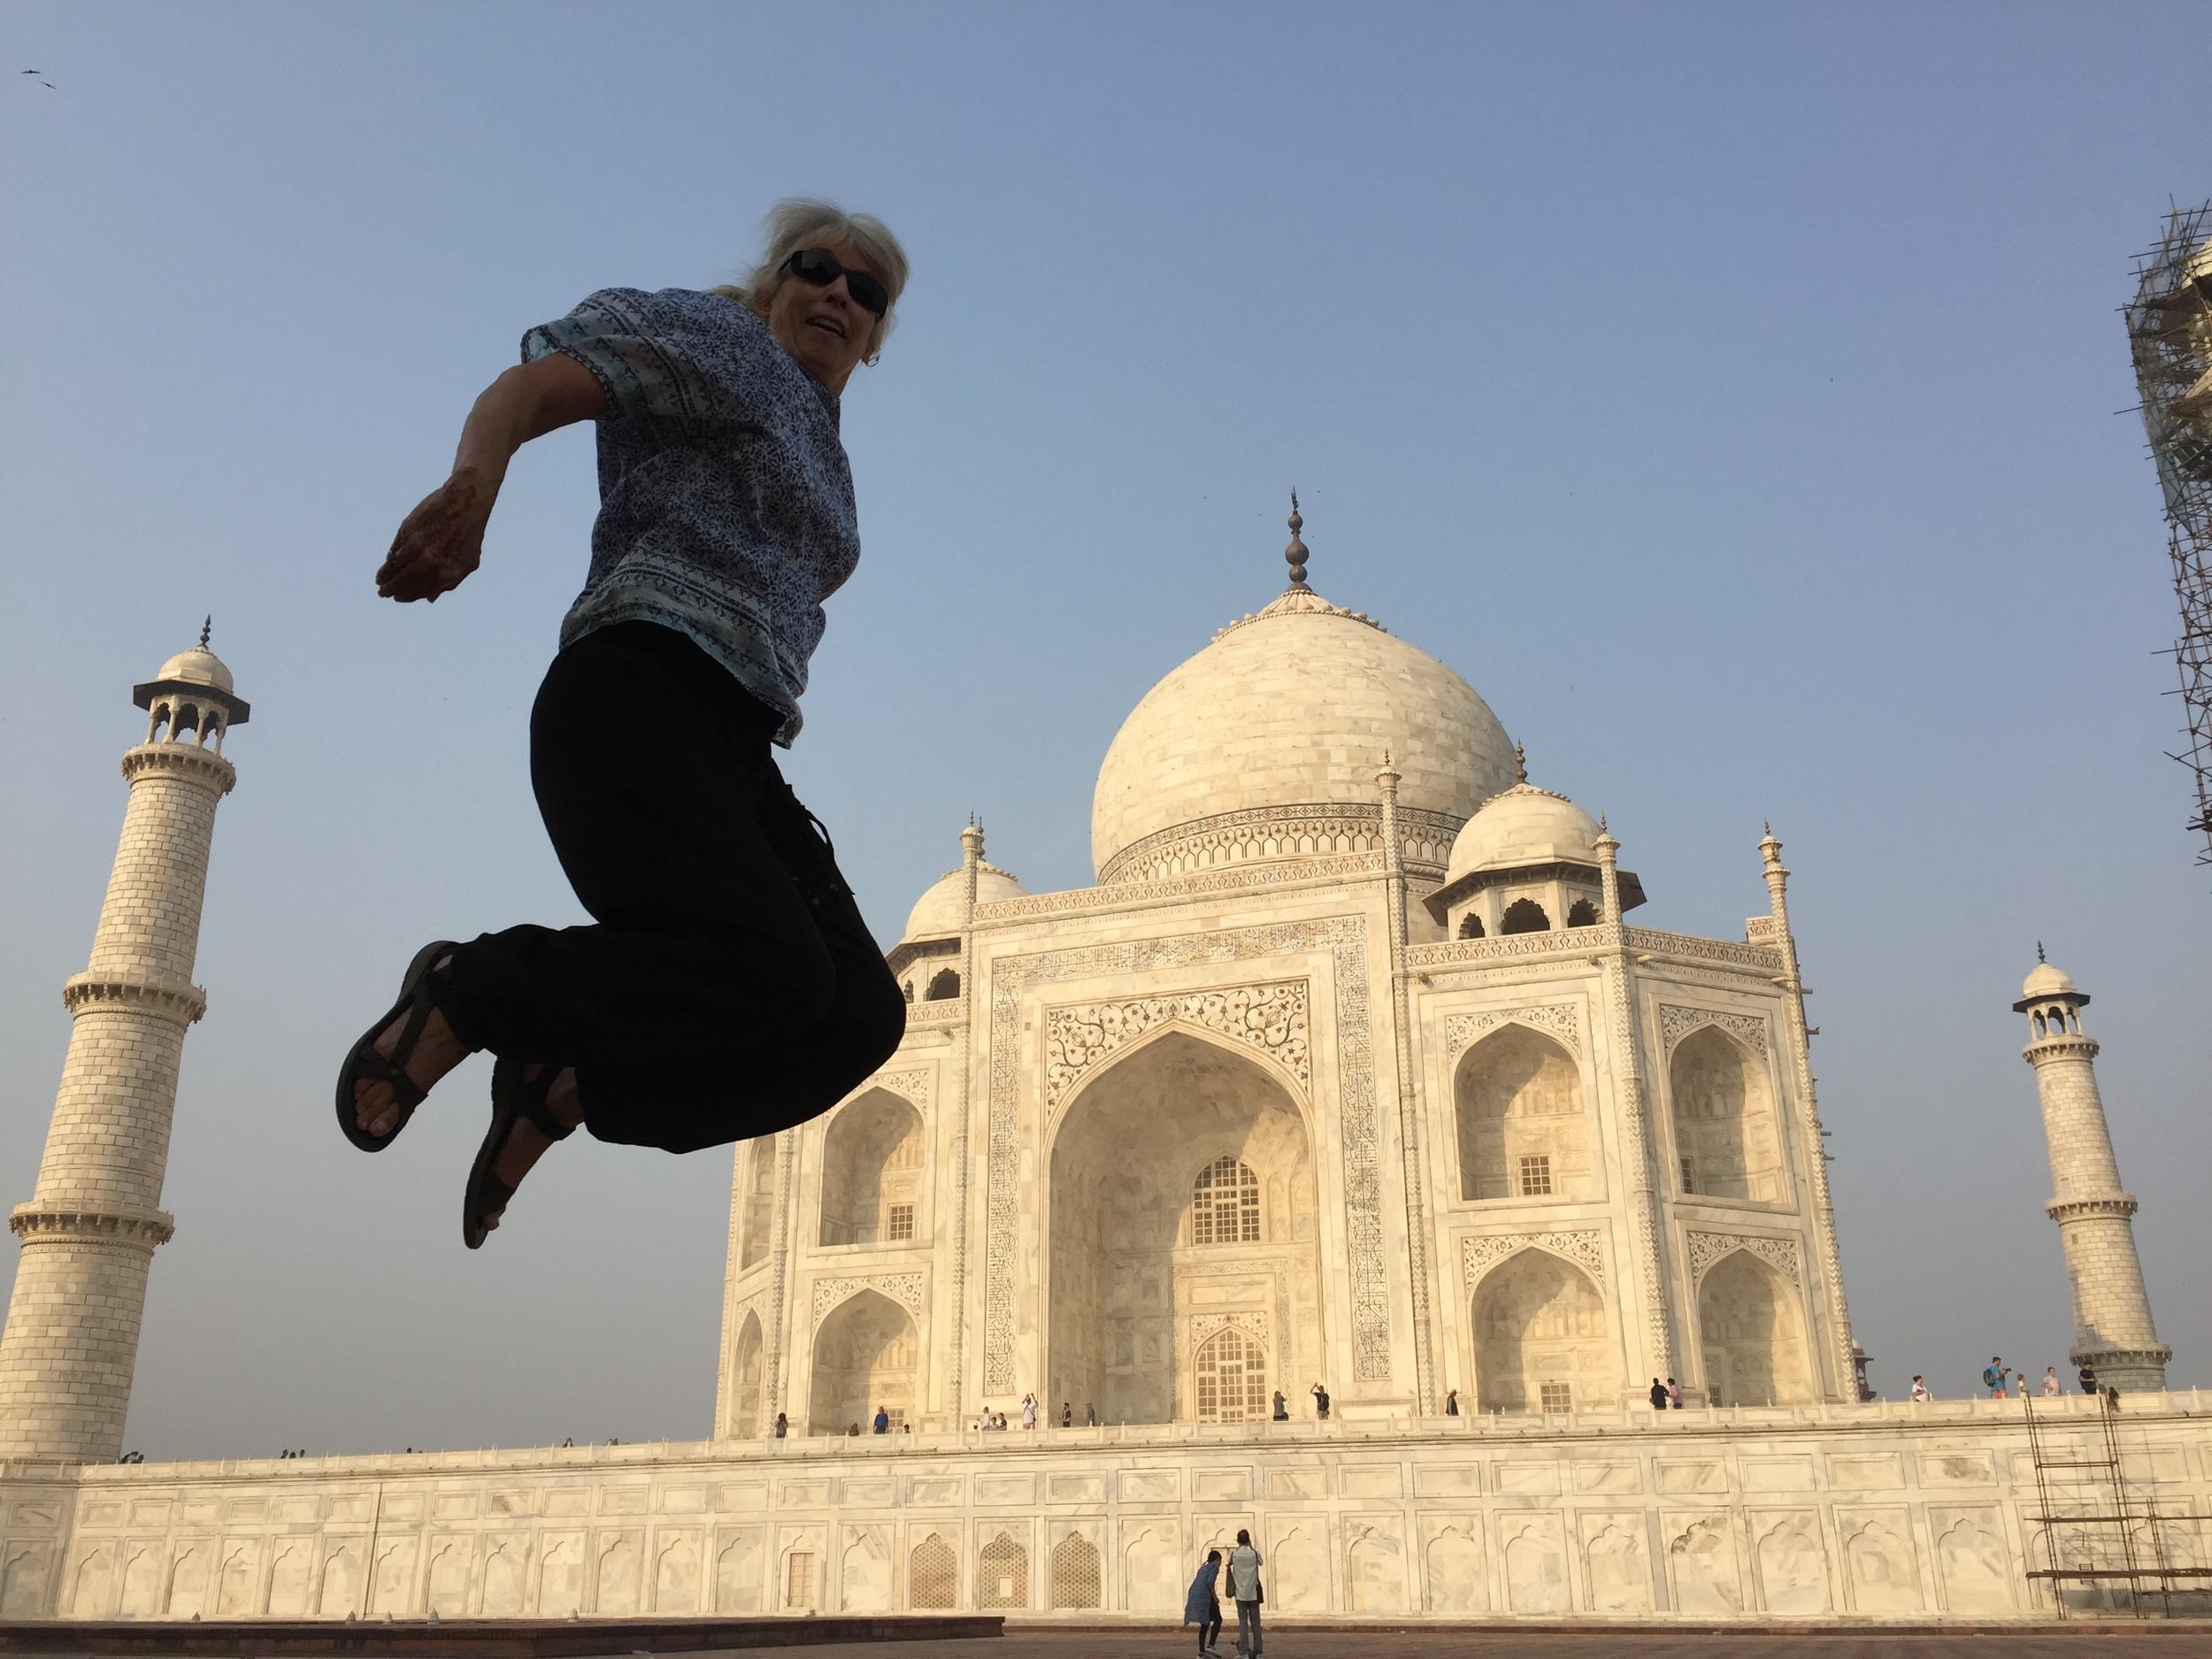 And a jump shot!